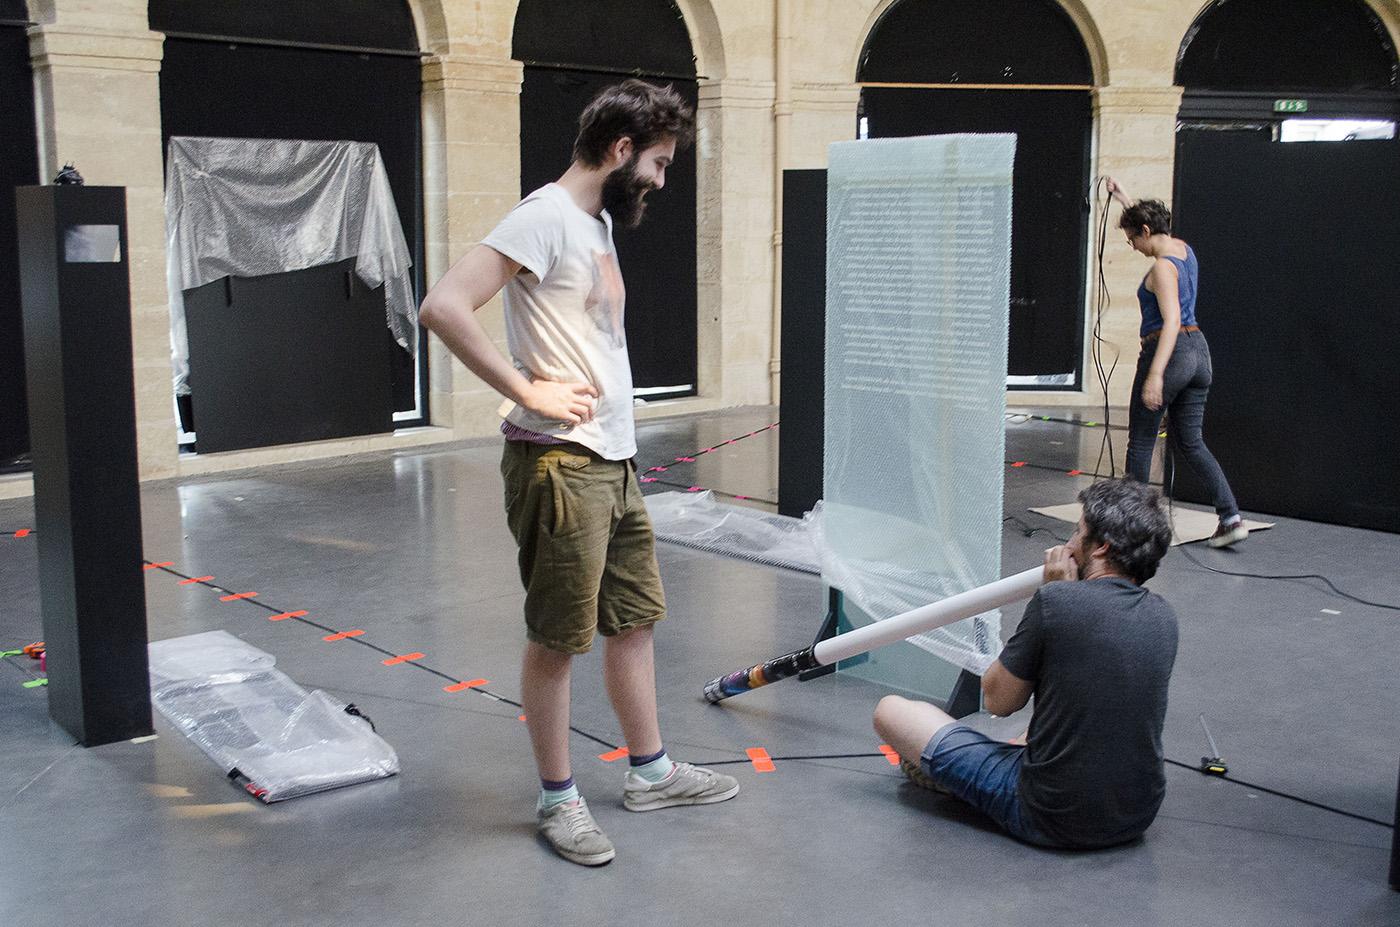 Guillaume tente le vuvuzela avec le carton d'emballage